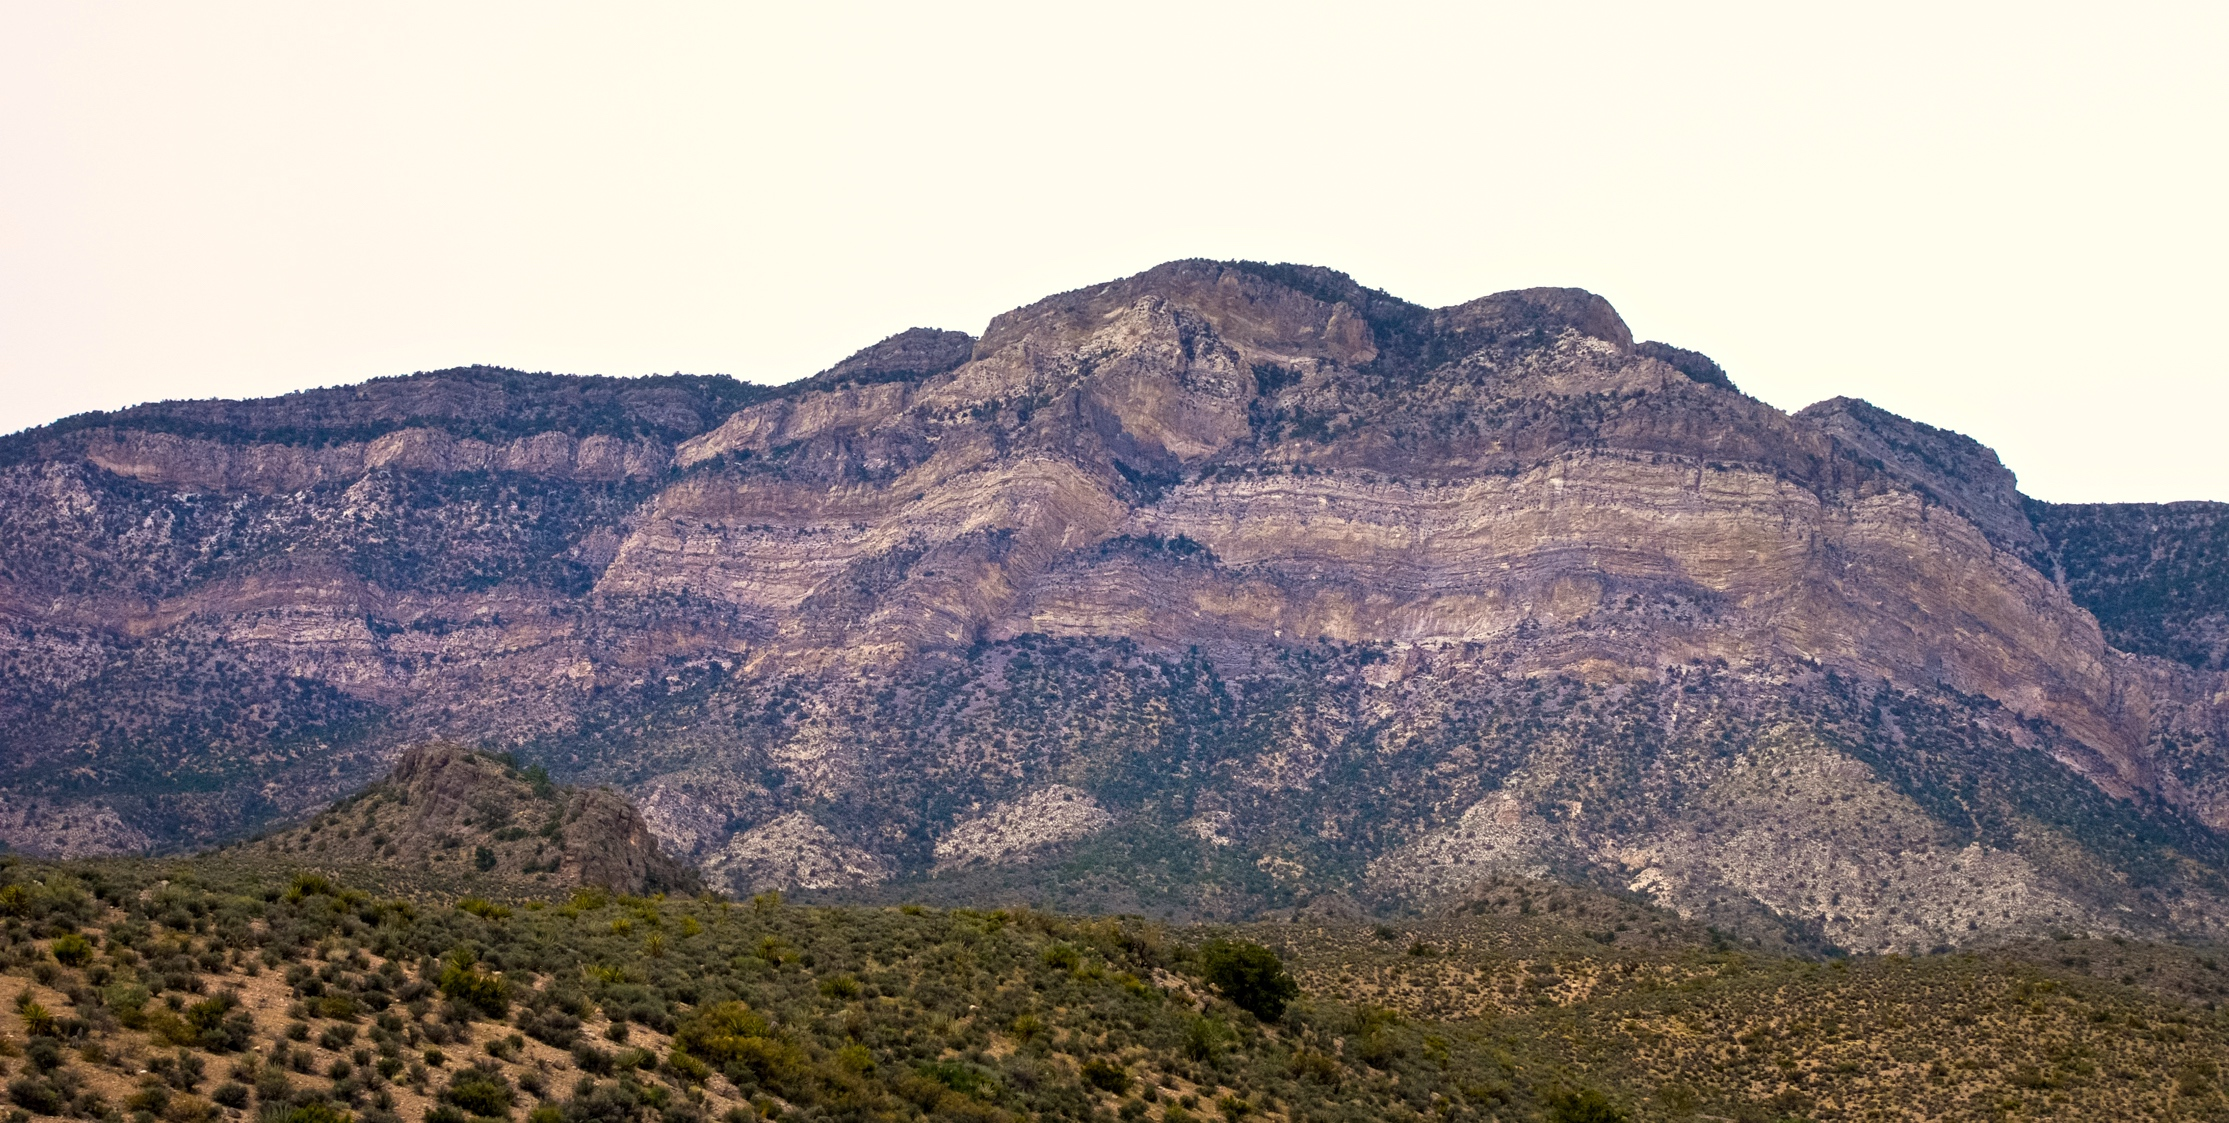 @ Red Rock Canyon_Nevada_ 4.15.18[.jpg